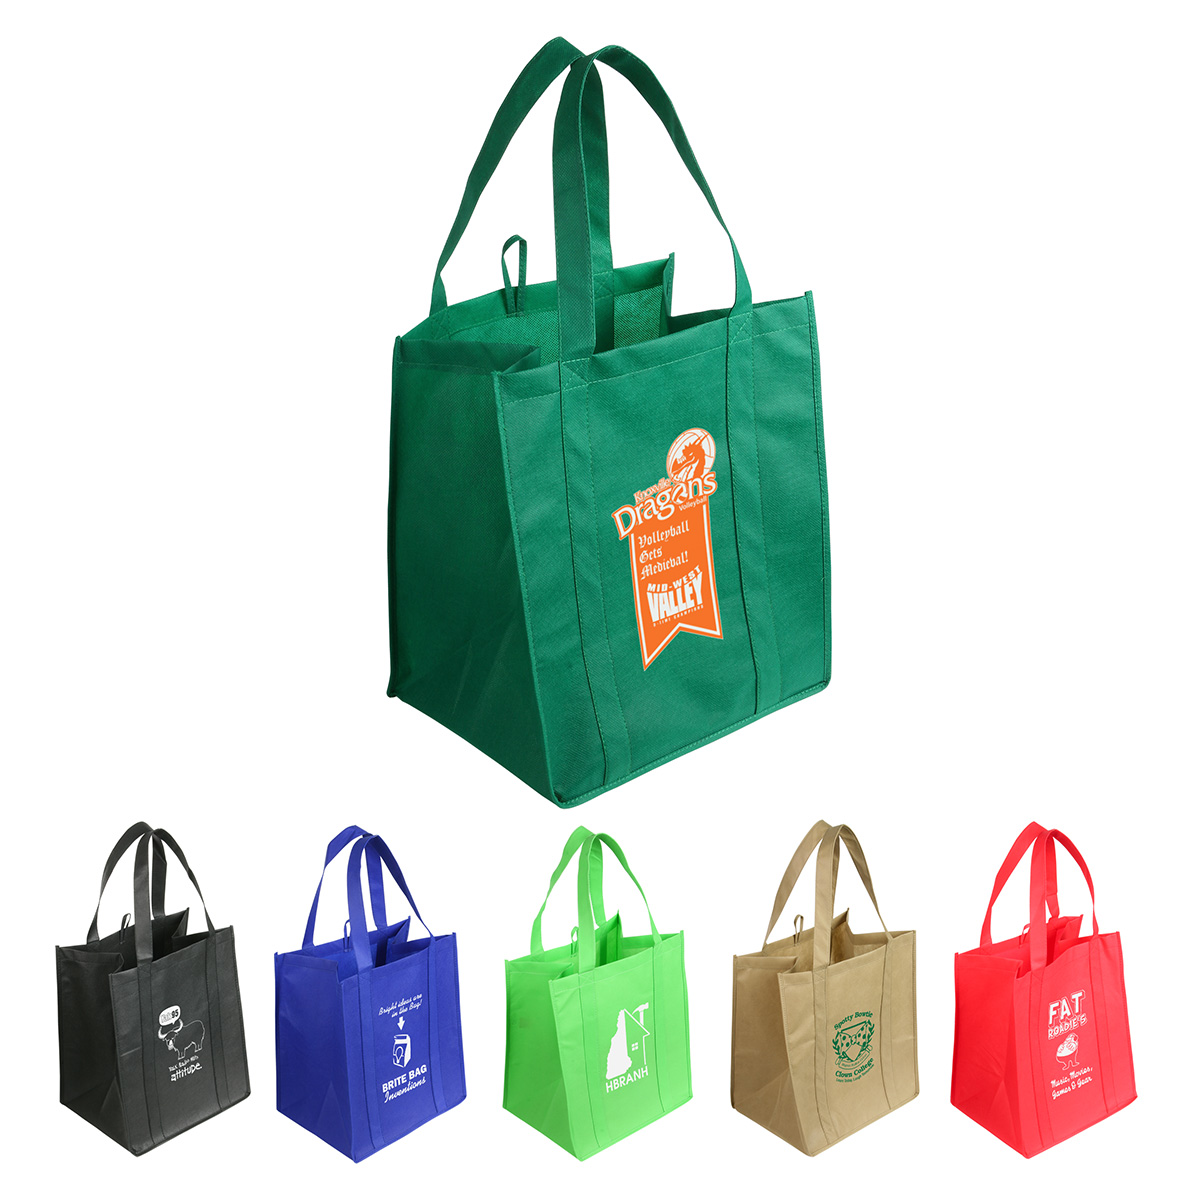 Sunbeam Jumbo Tote Shopping Bag, WBA-SJ09 - 1 Colour Imprint